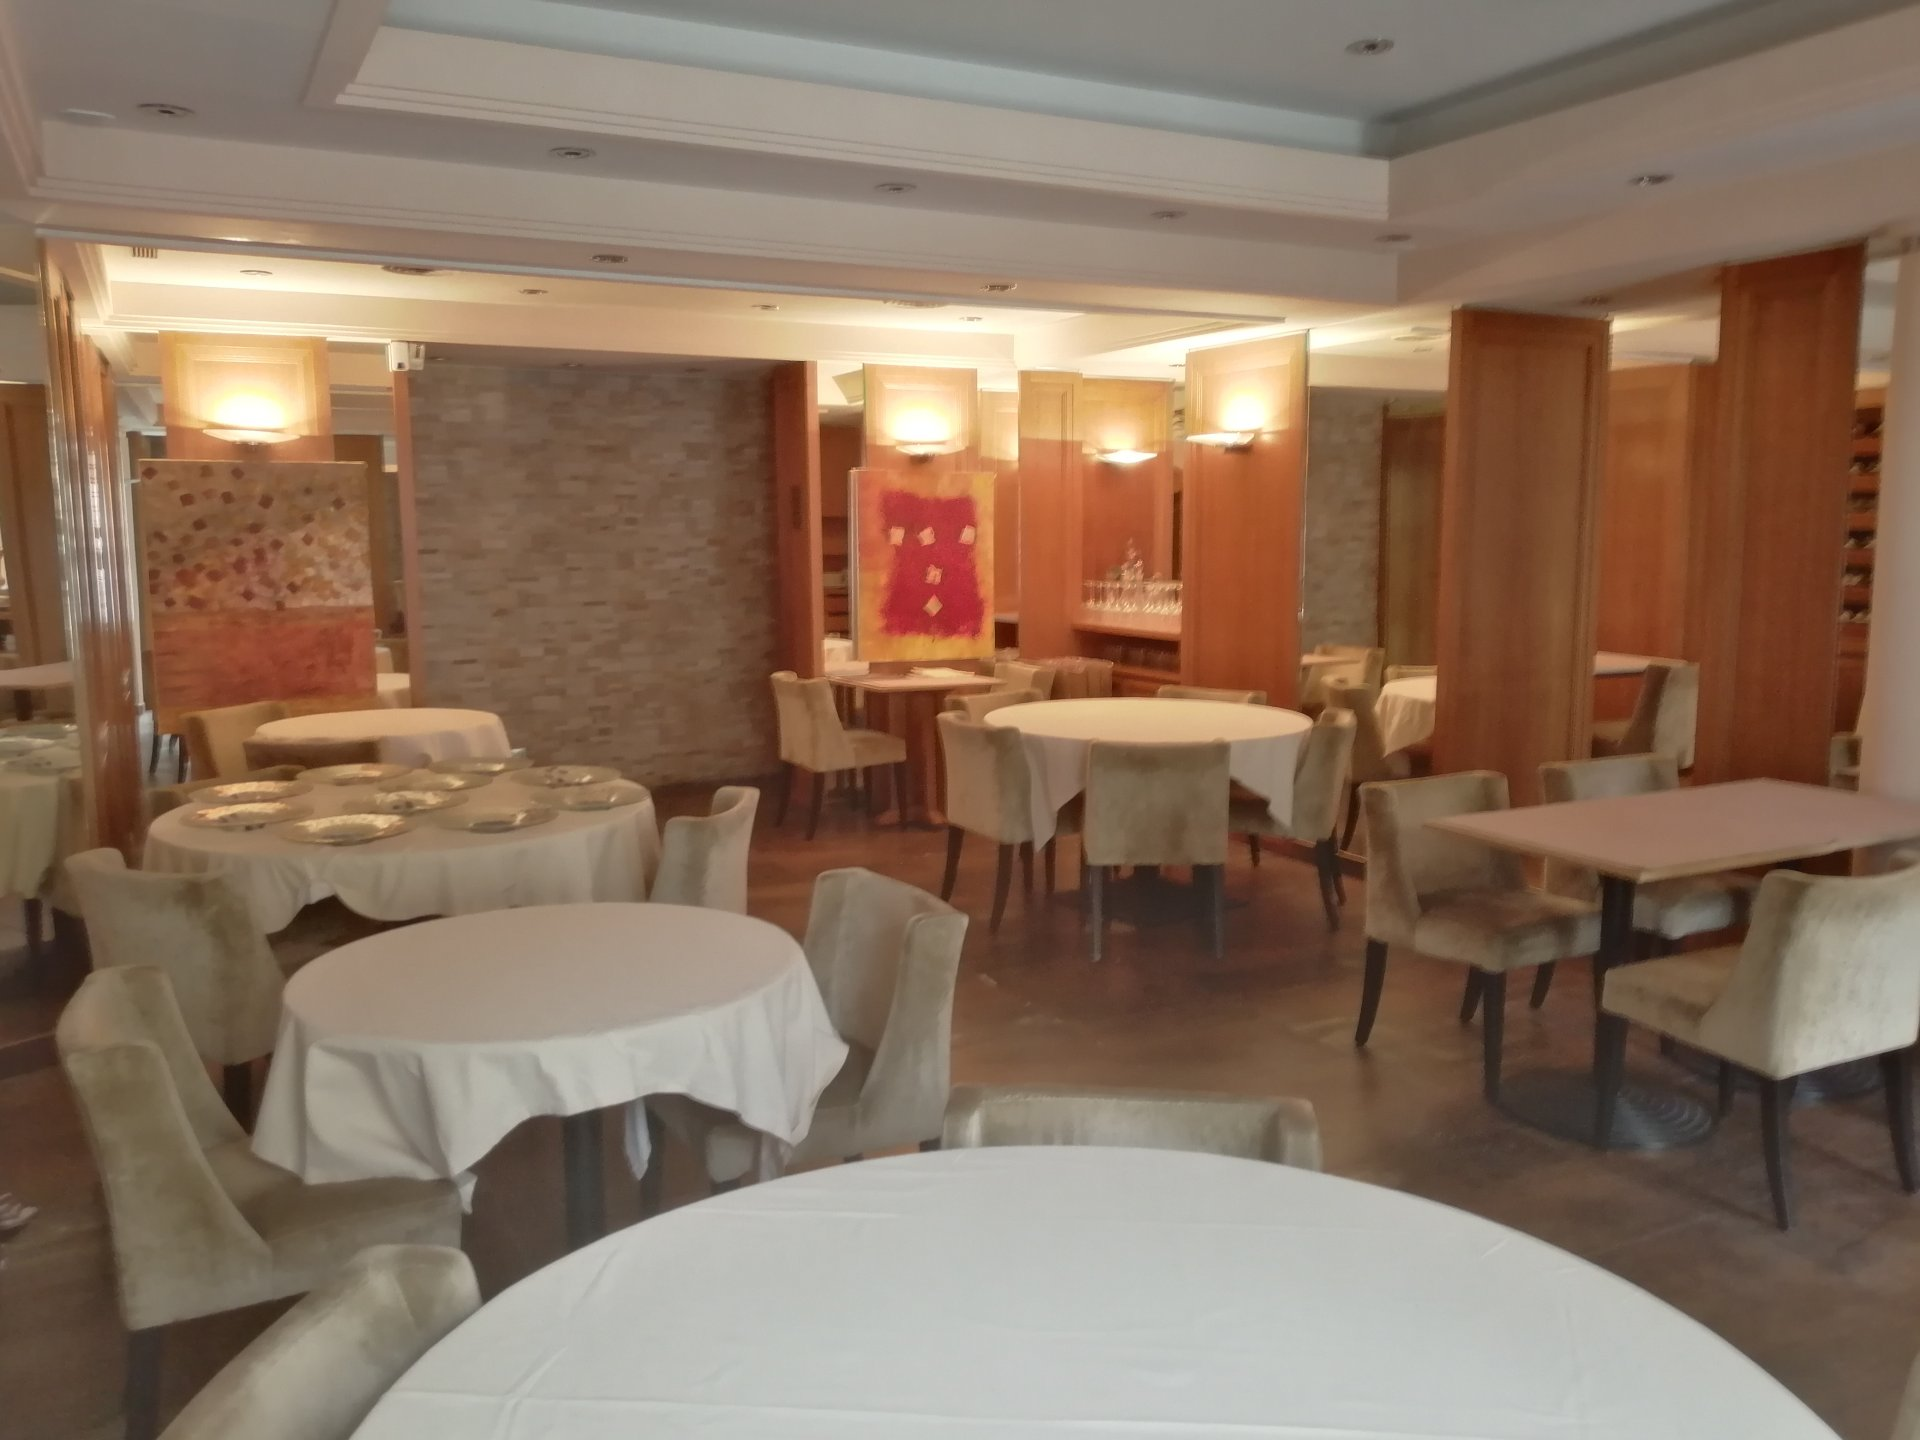 CARRE D'OR - Restaurant